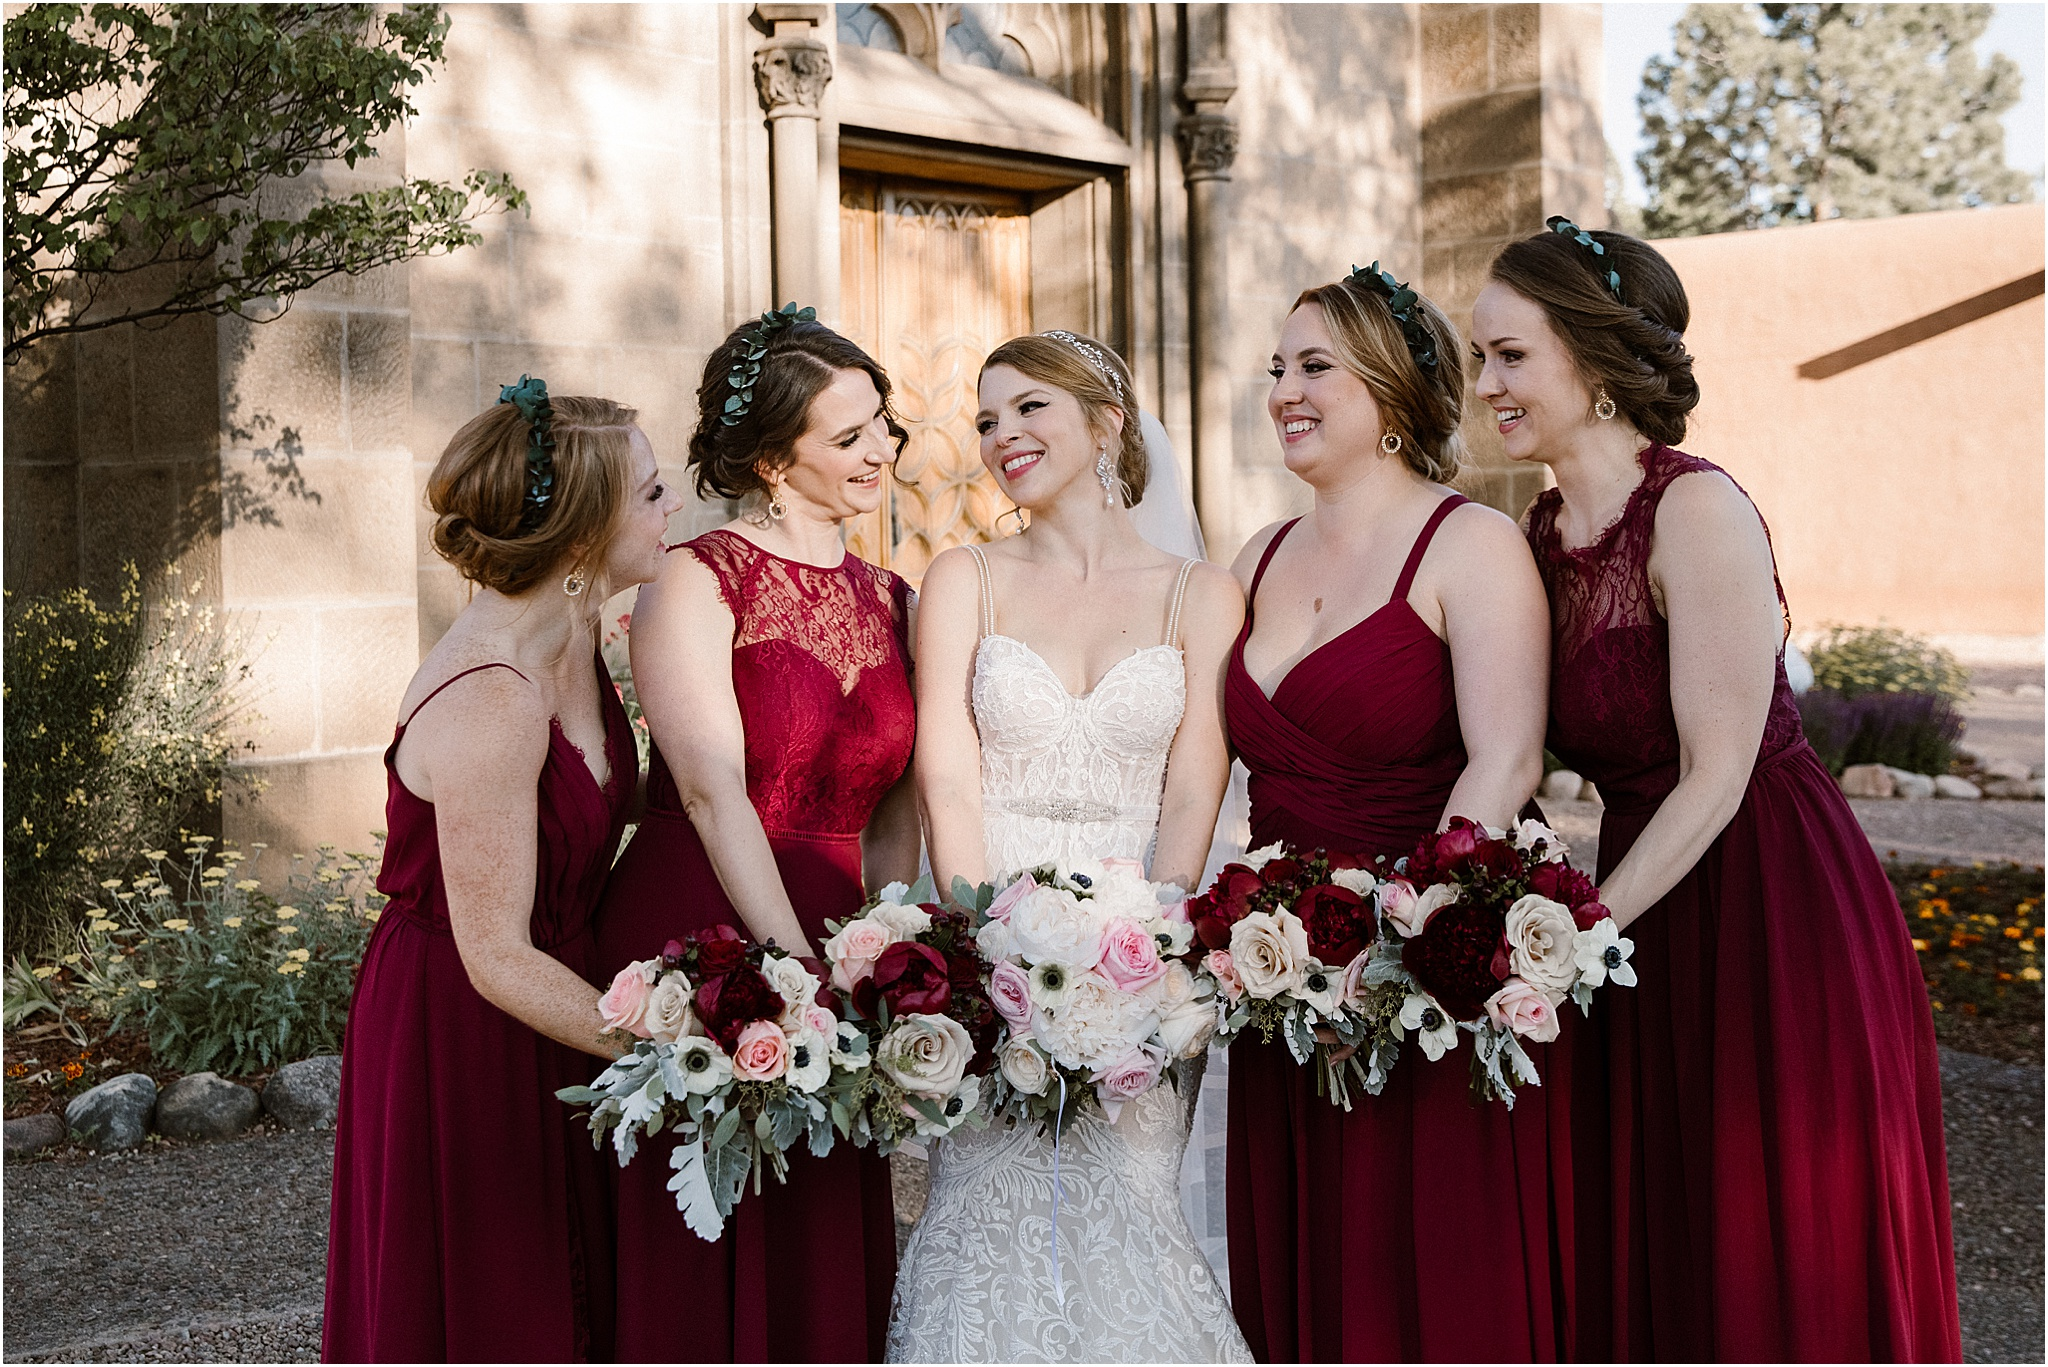 BLUE ROSE PHOTOGRAPHY SANTA FE WEDDING_30